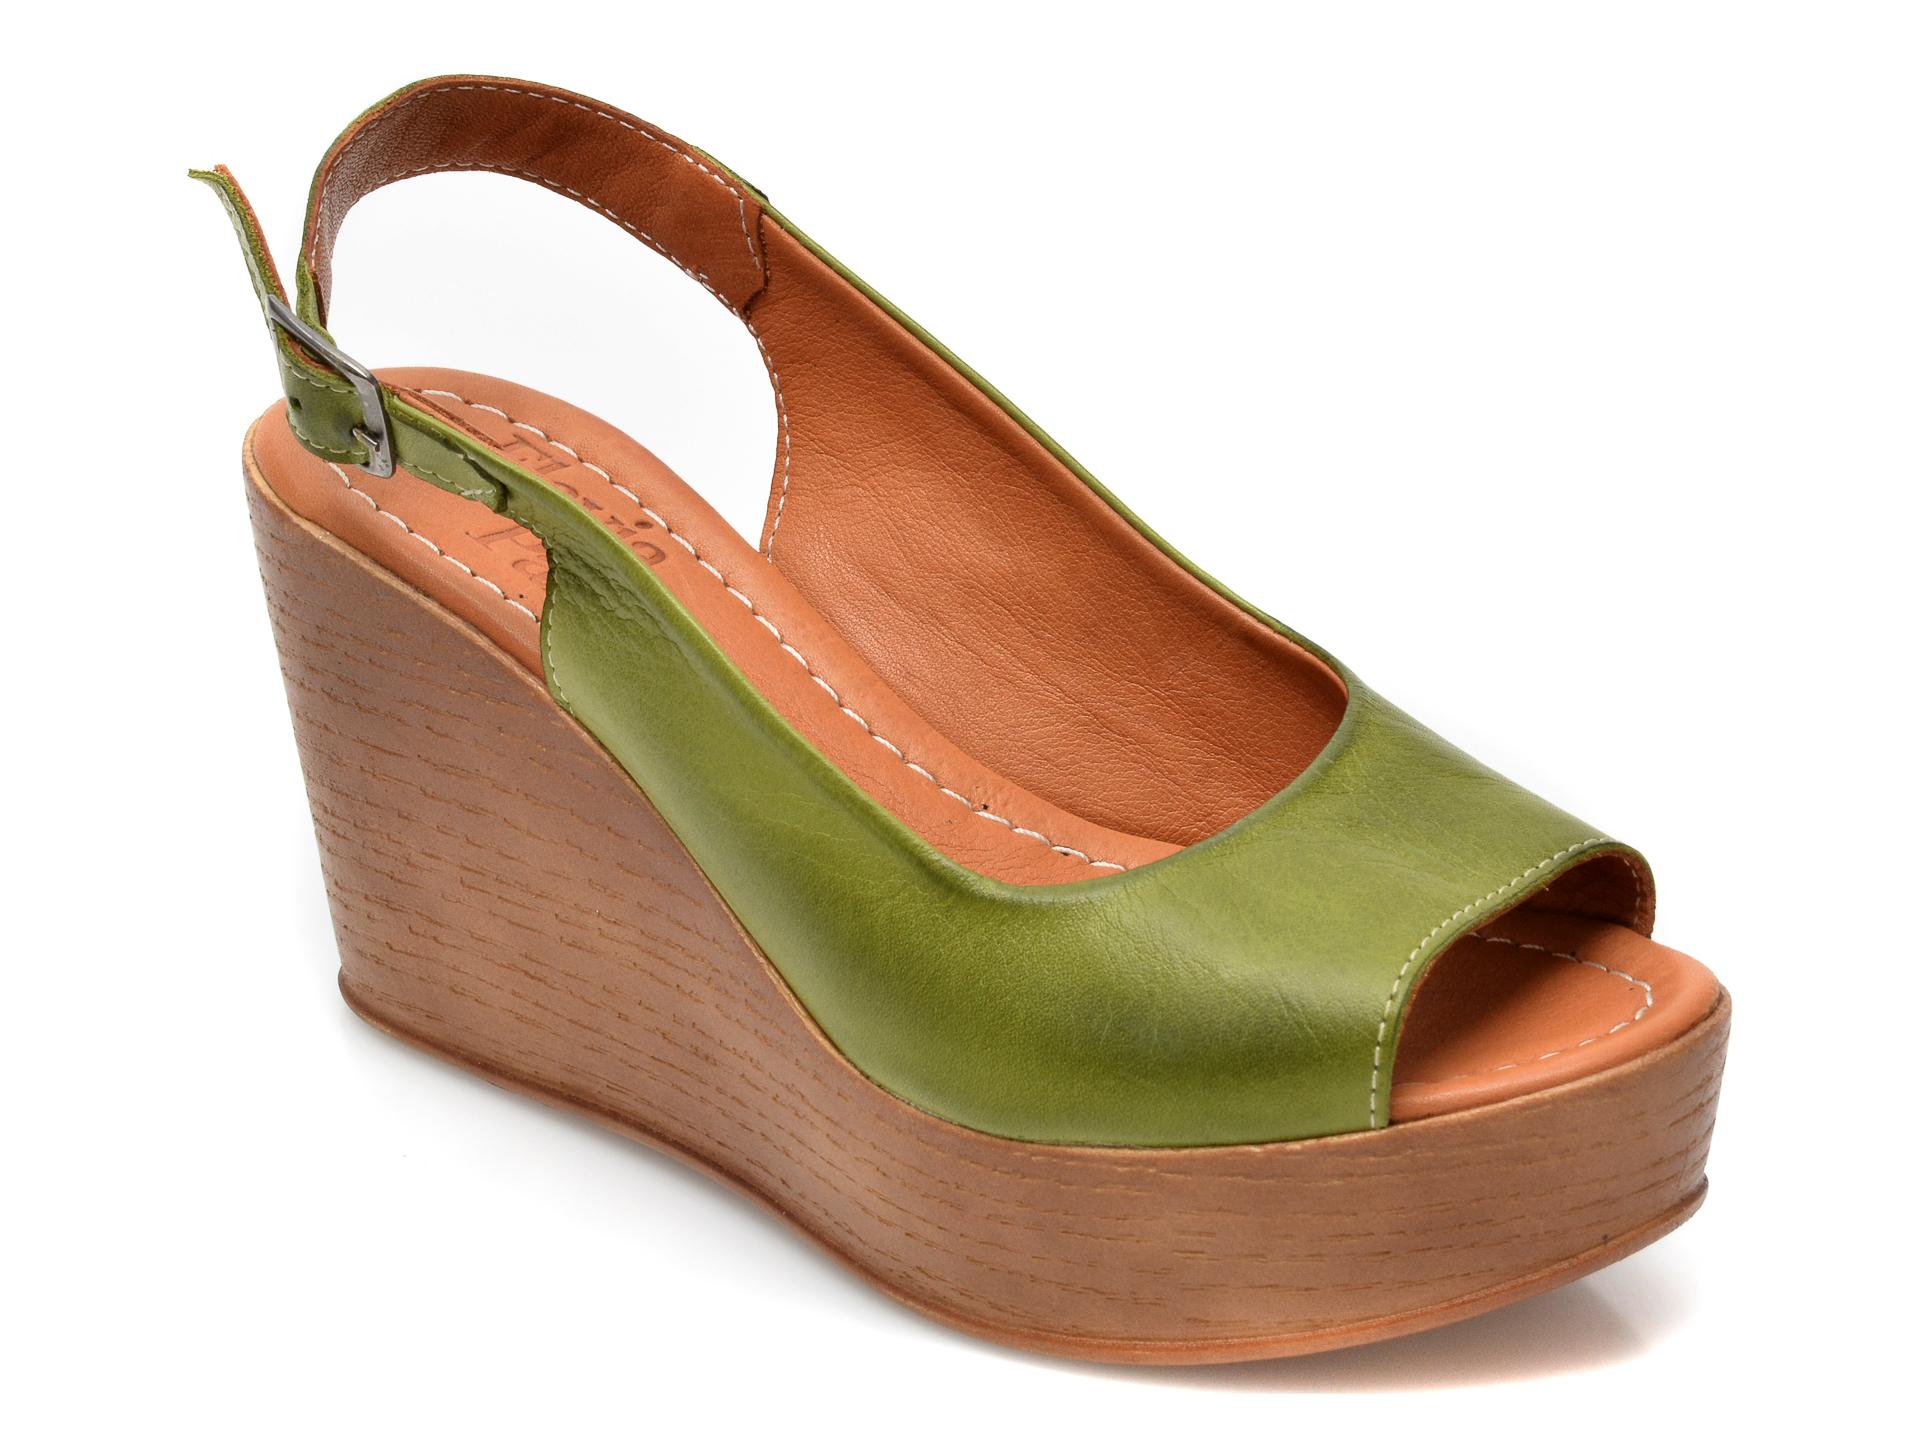 Sandale FLAVIA PASSINI verzi, 20801, din piele naturala imagine otter.ro